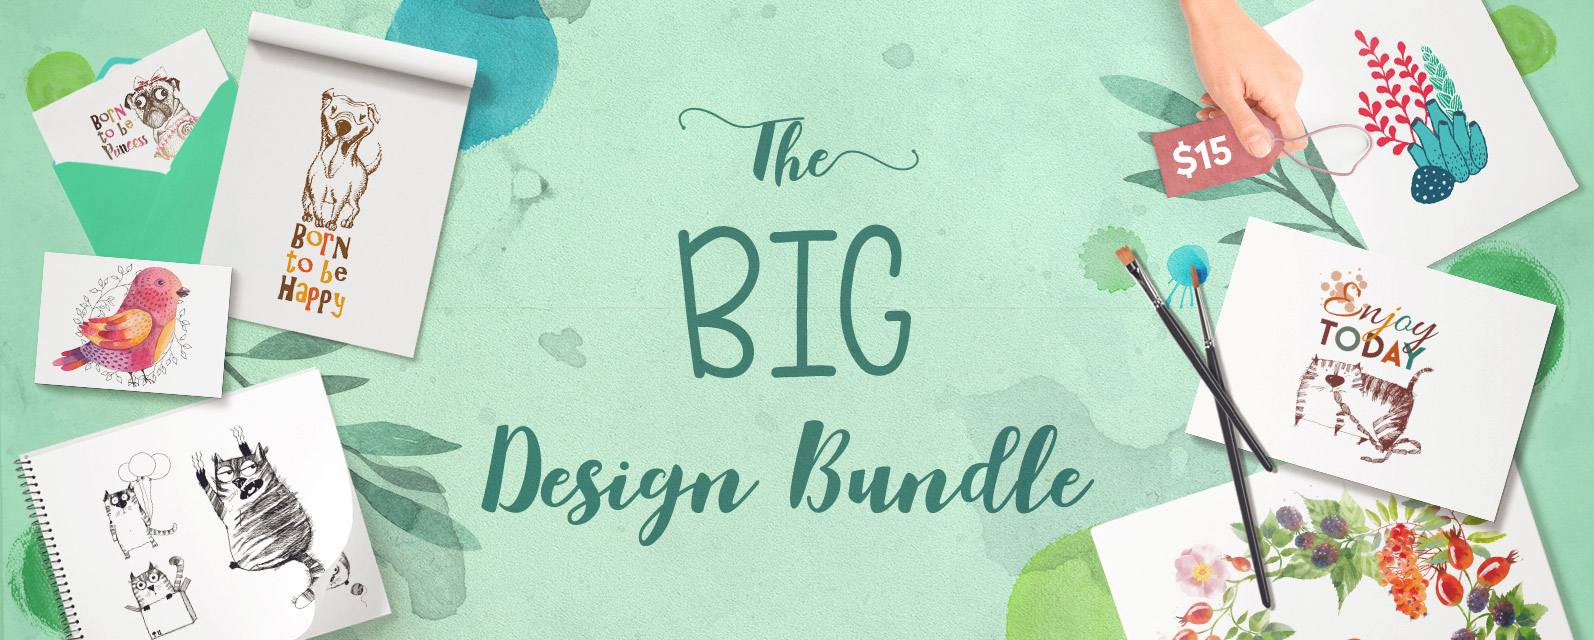 Big Design Bundle Cover